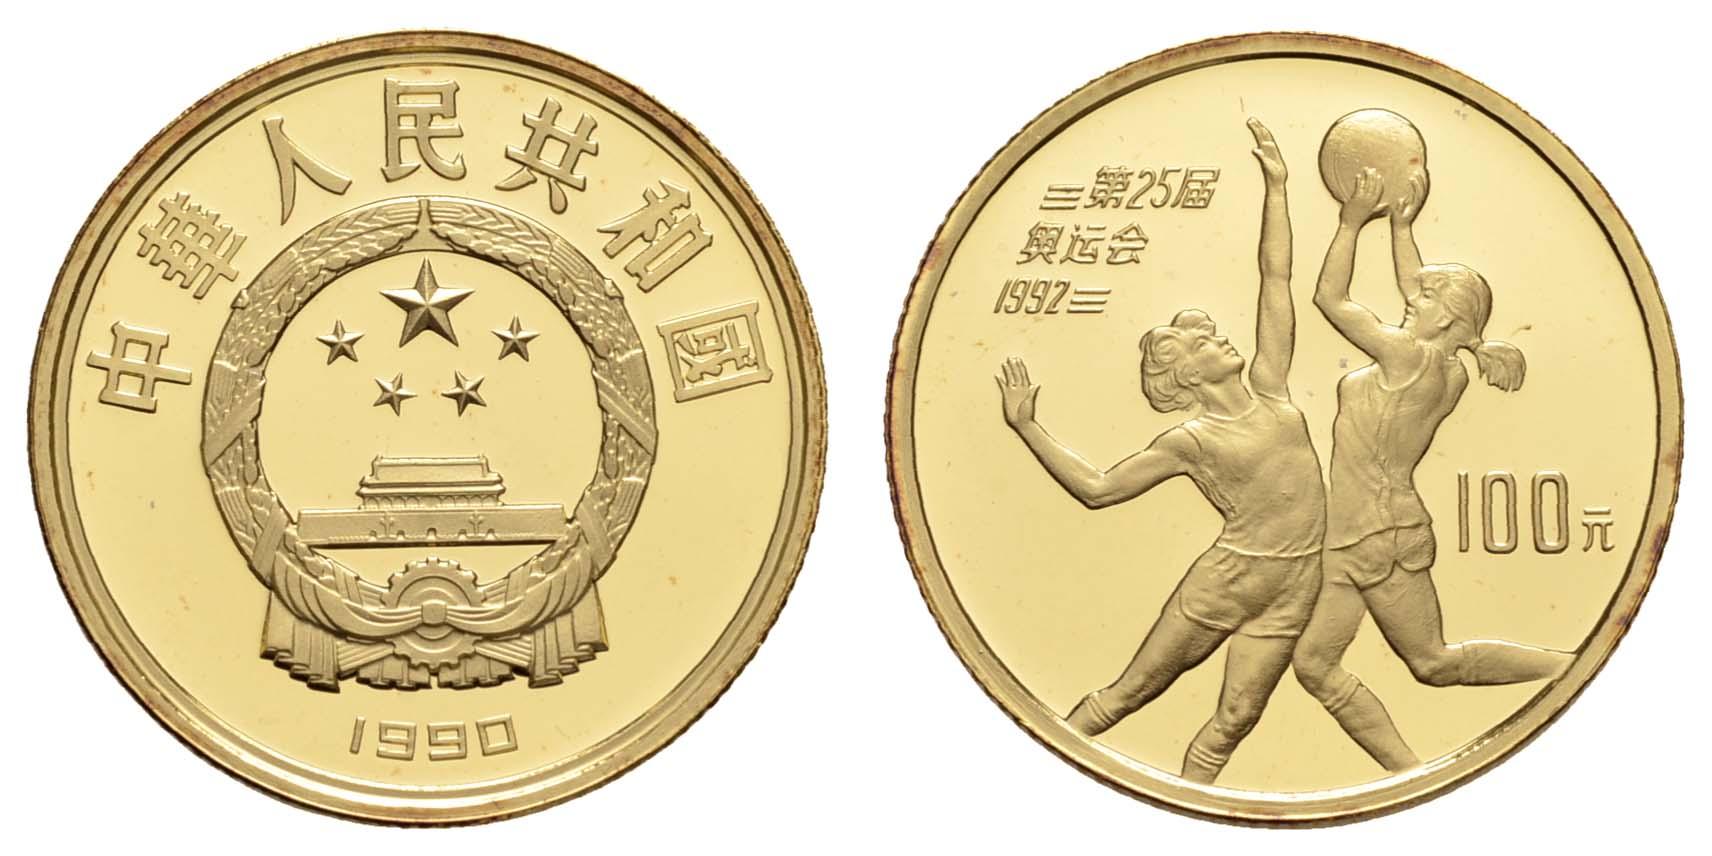 Lot 1905 - übersee China -  Auktionshaus Ulrich Felzmann GmbH & Co. KG Coins single lots